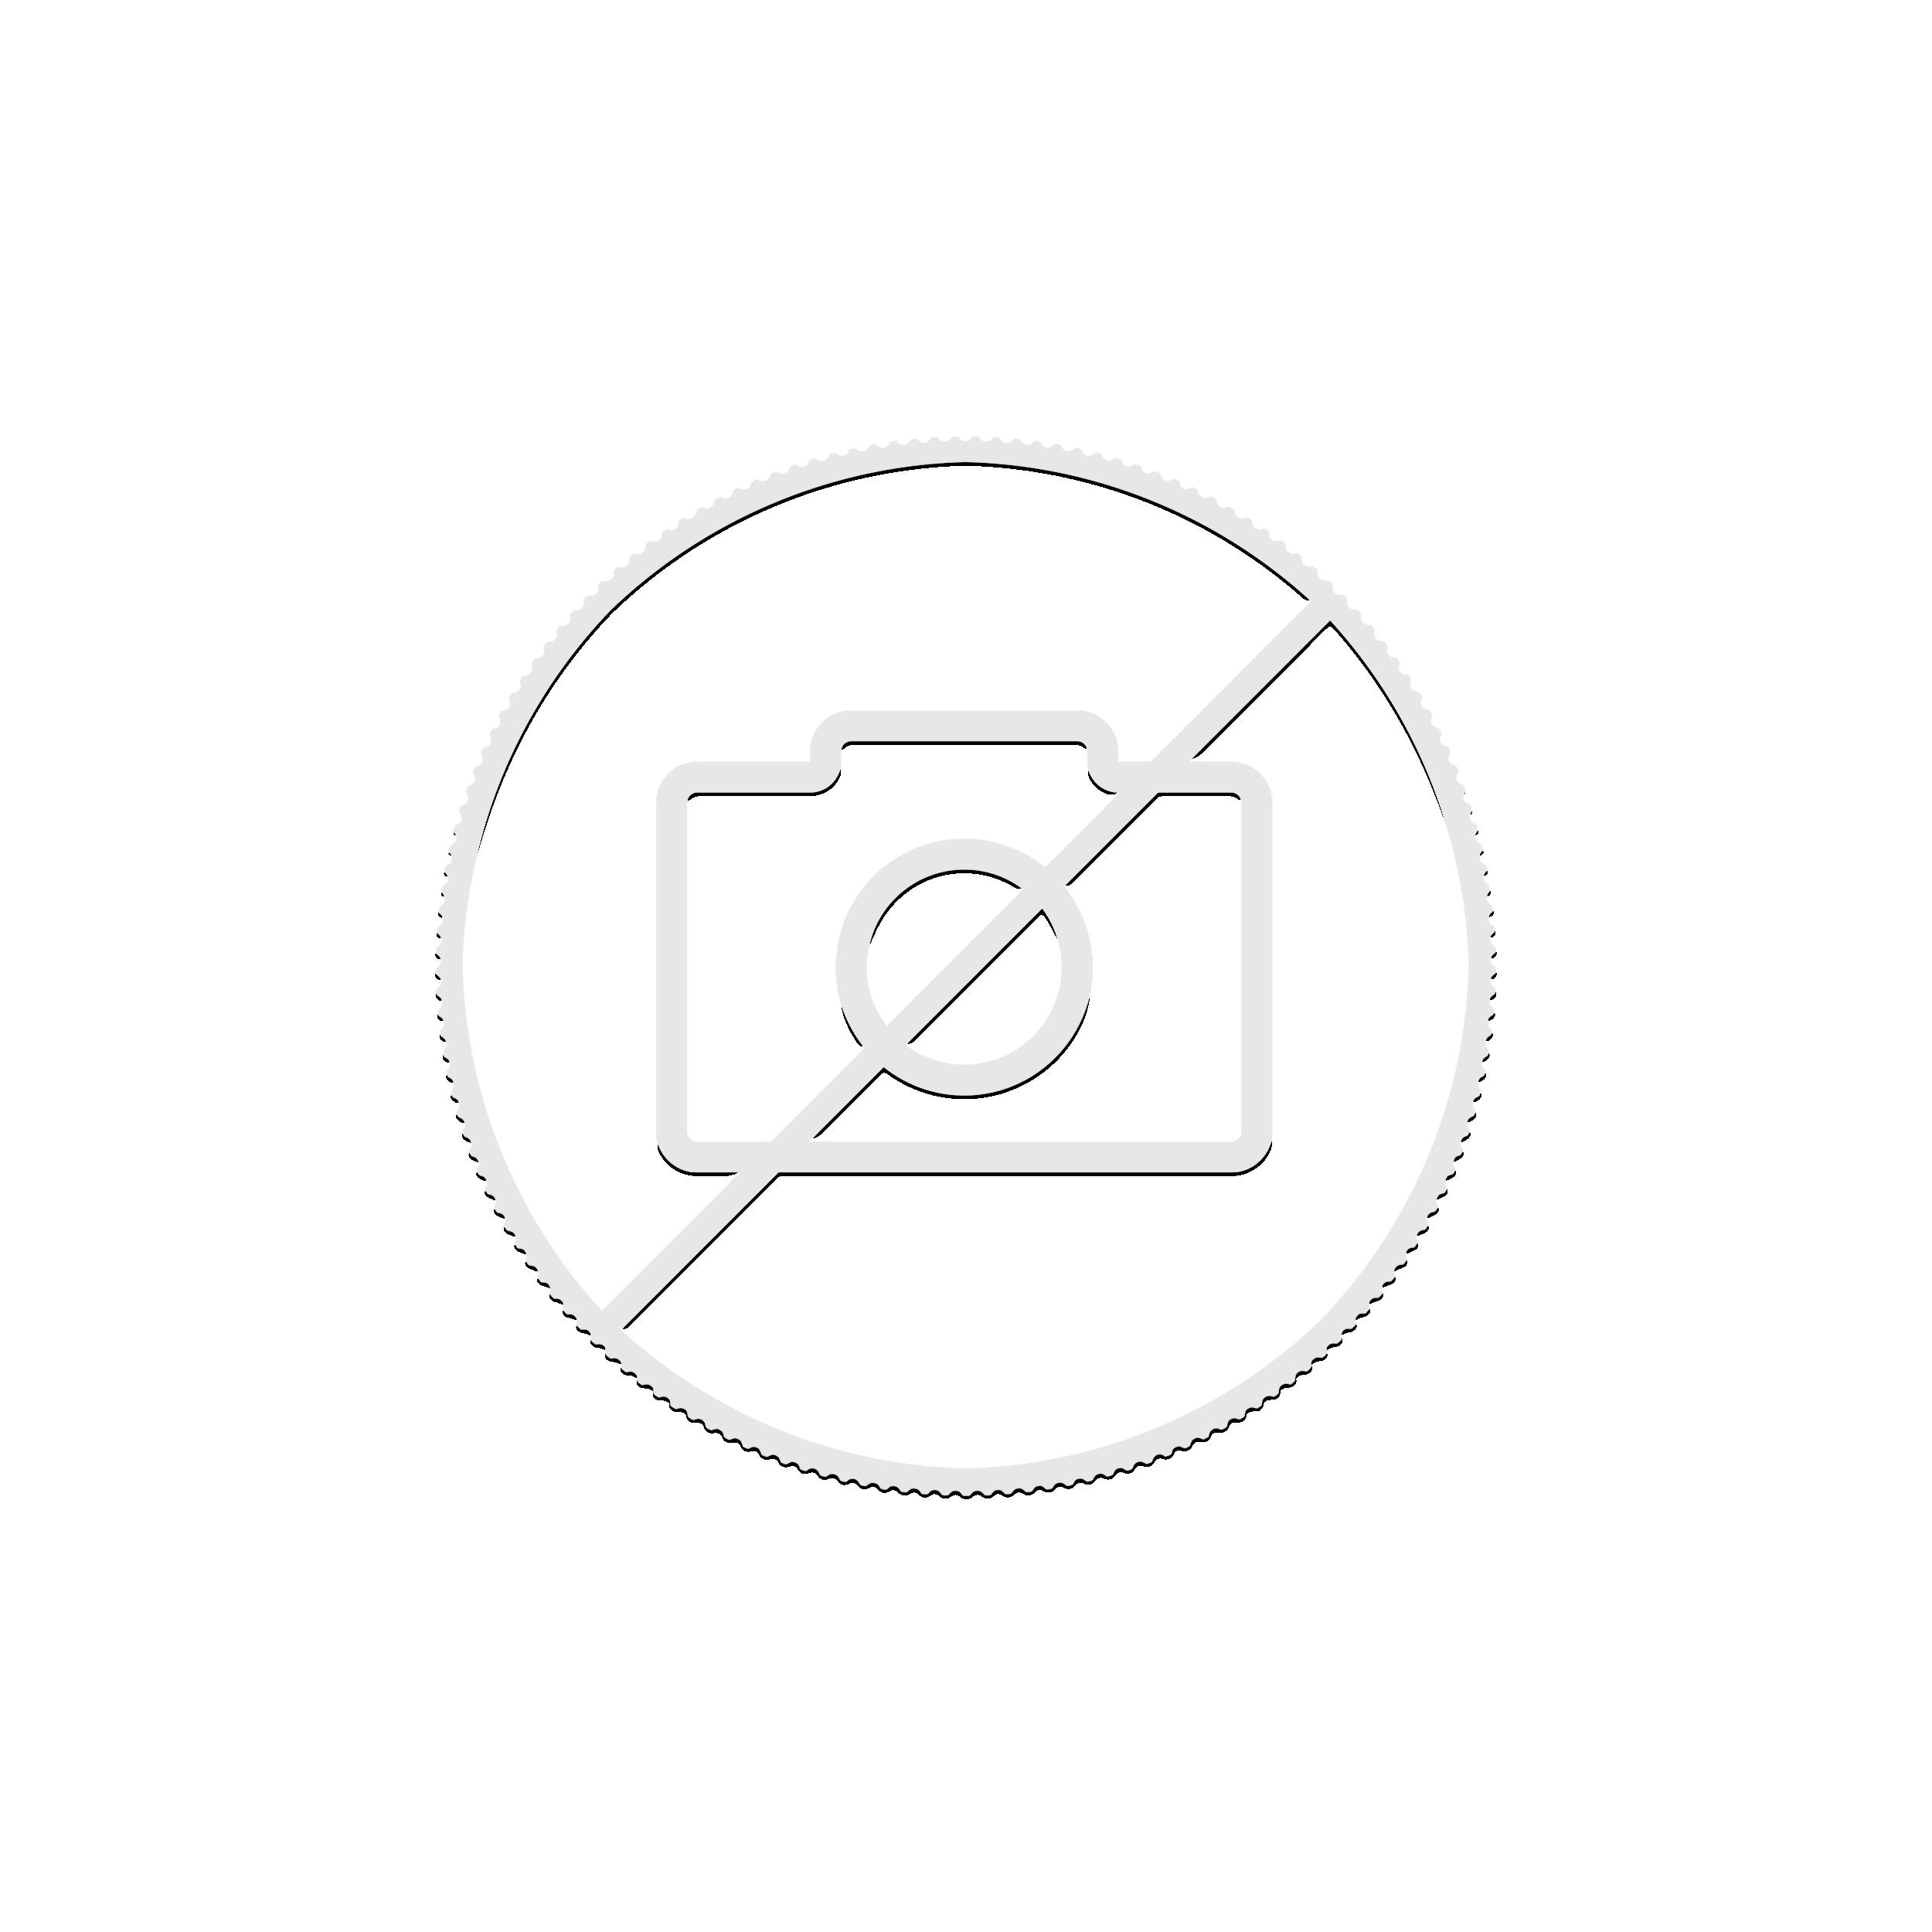 1/2 Troy ounce gold coin Krugerrand 2021